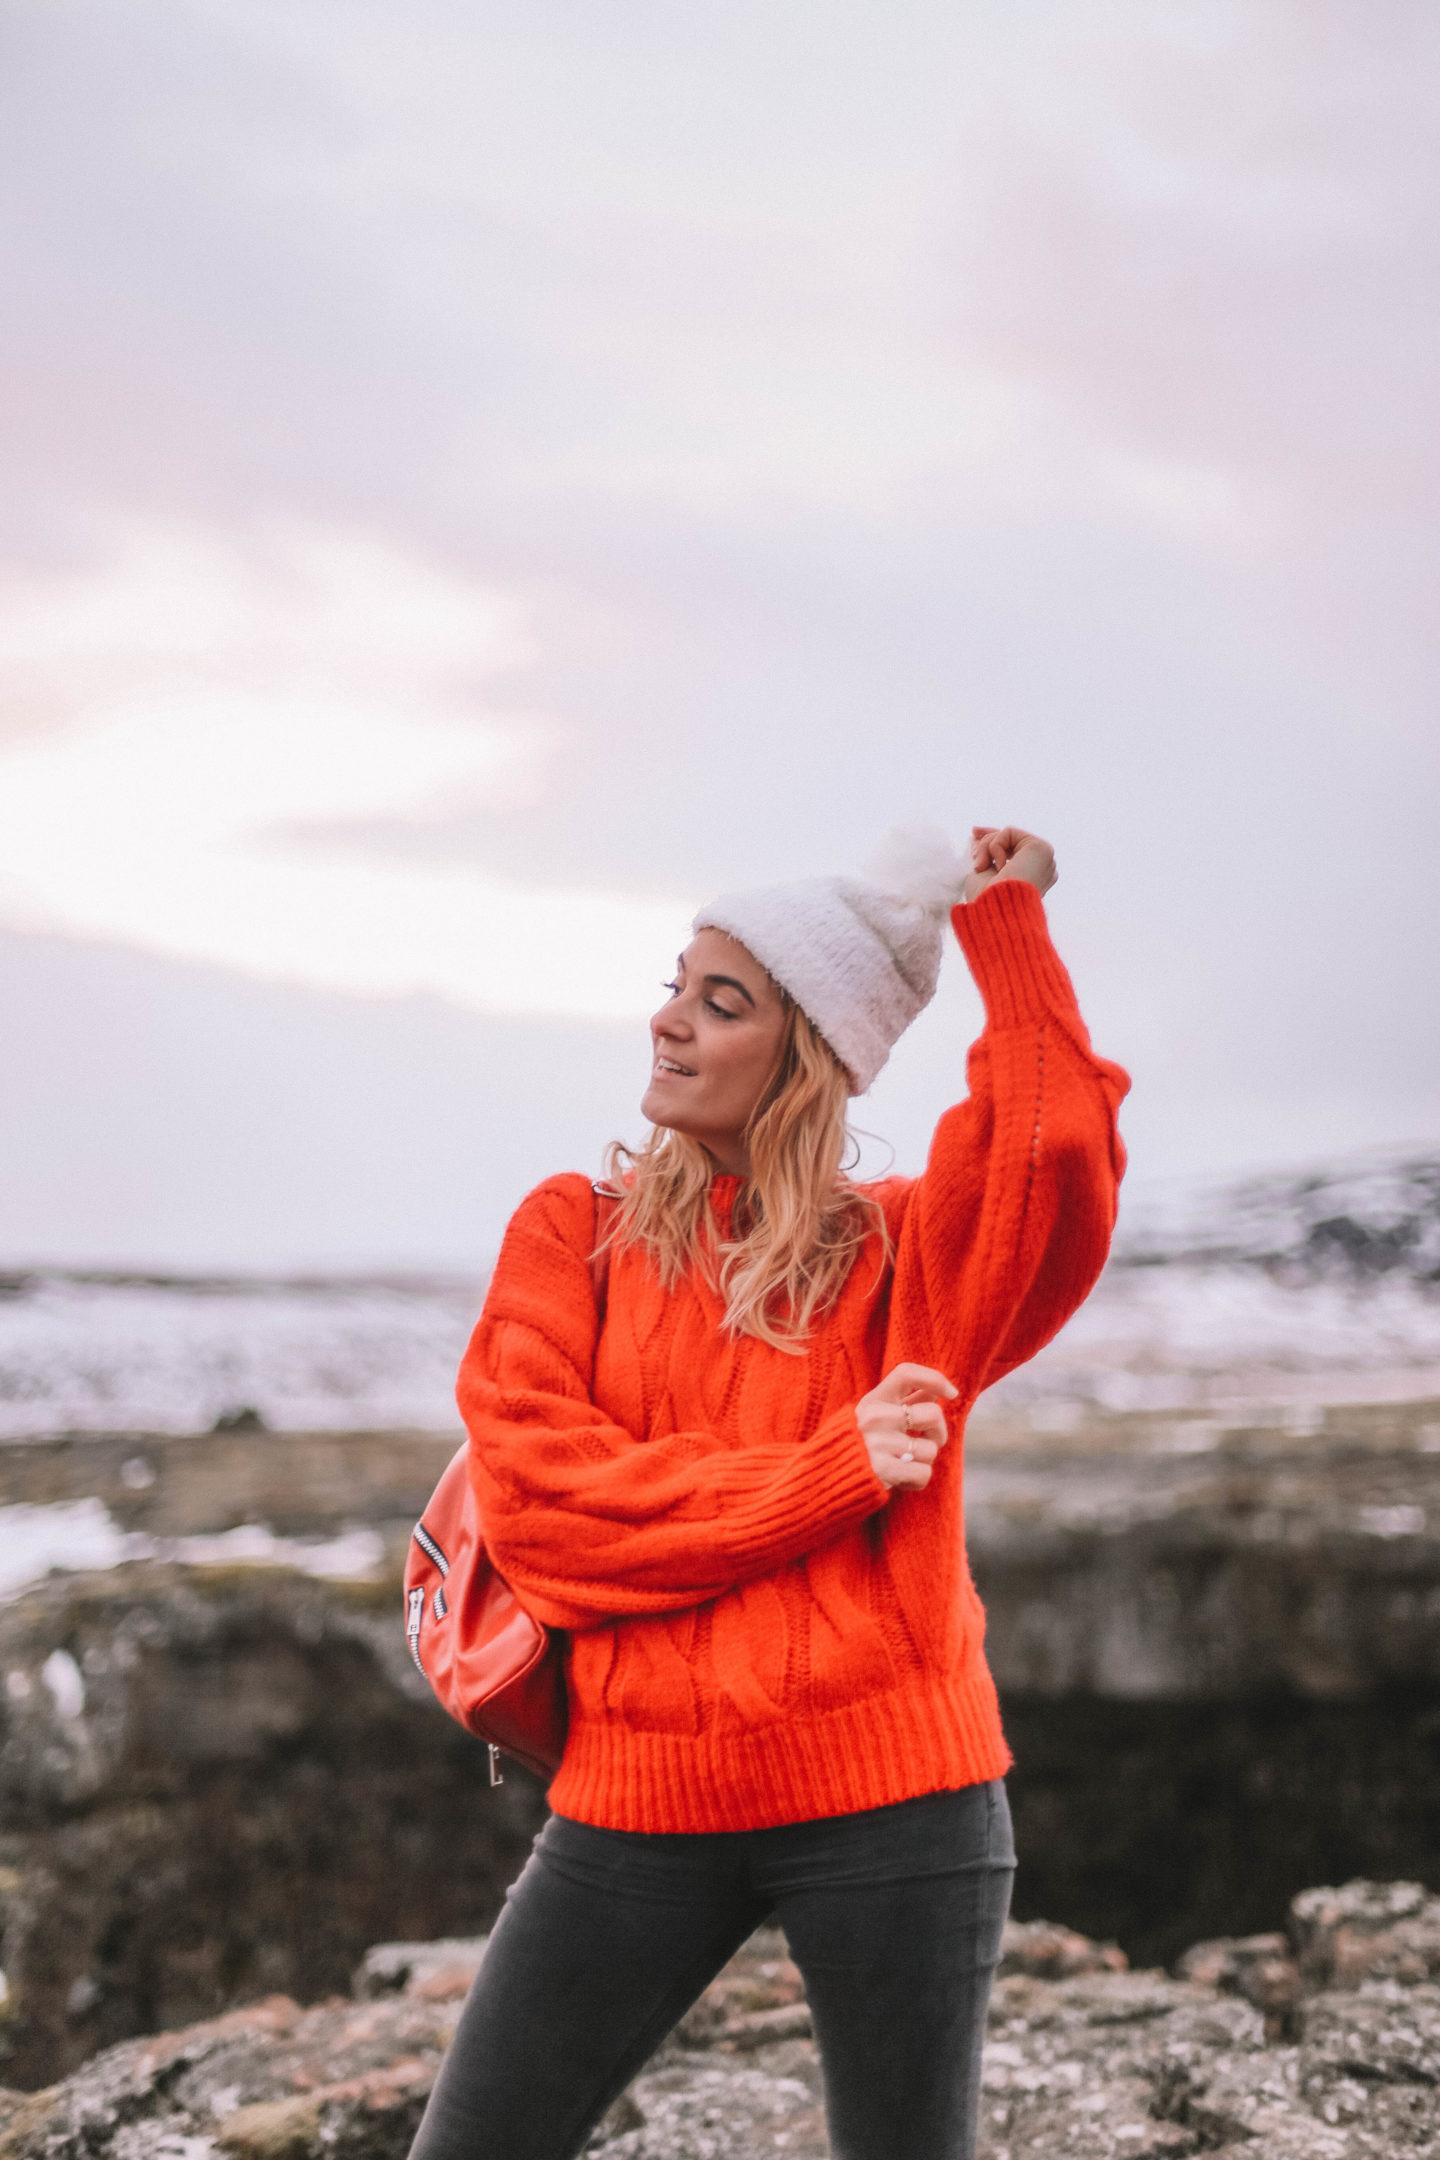 Bonnet Primark - Blondie Baby blog mode et voyages